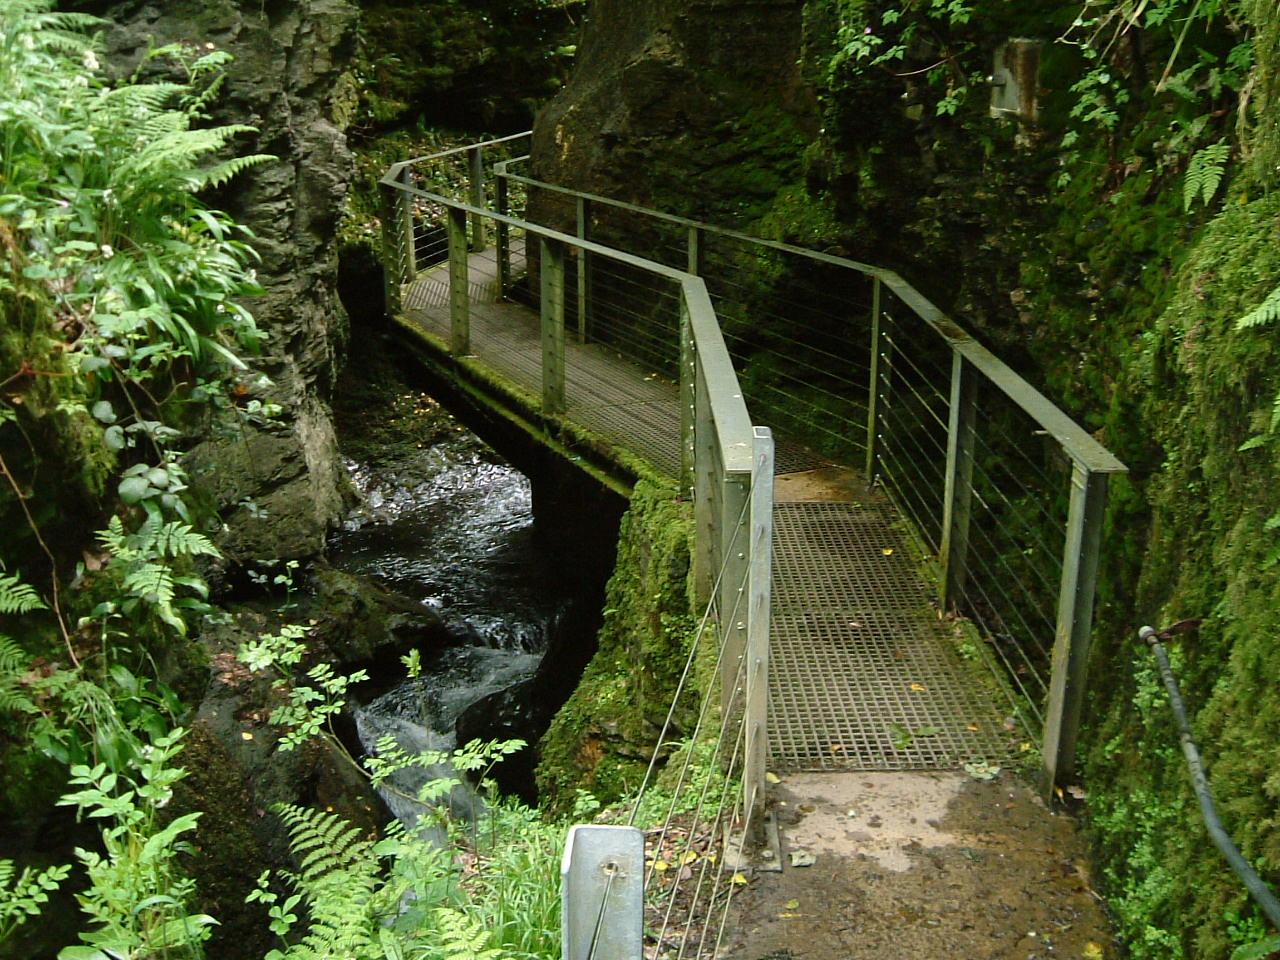 Bridges and Walkways